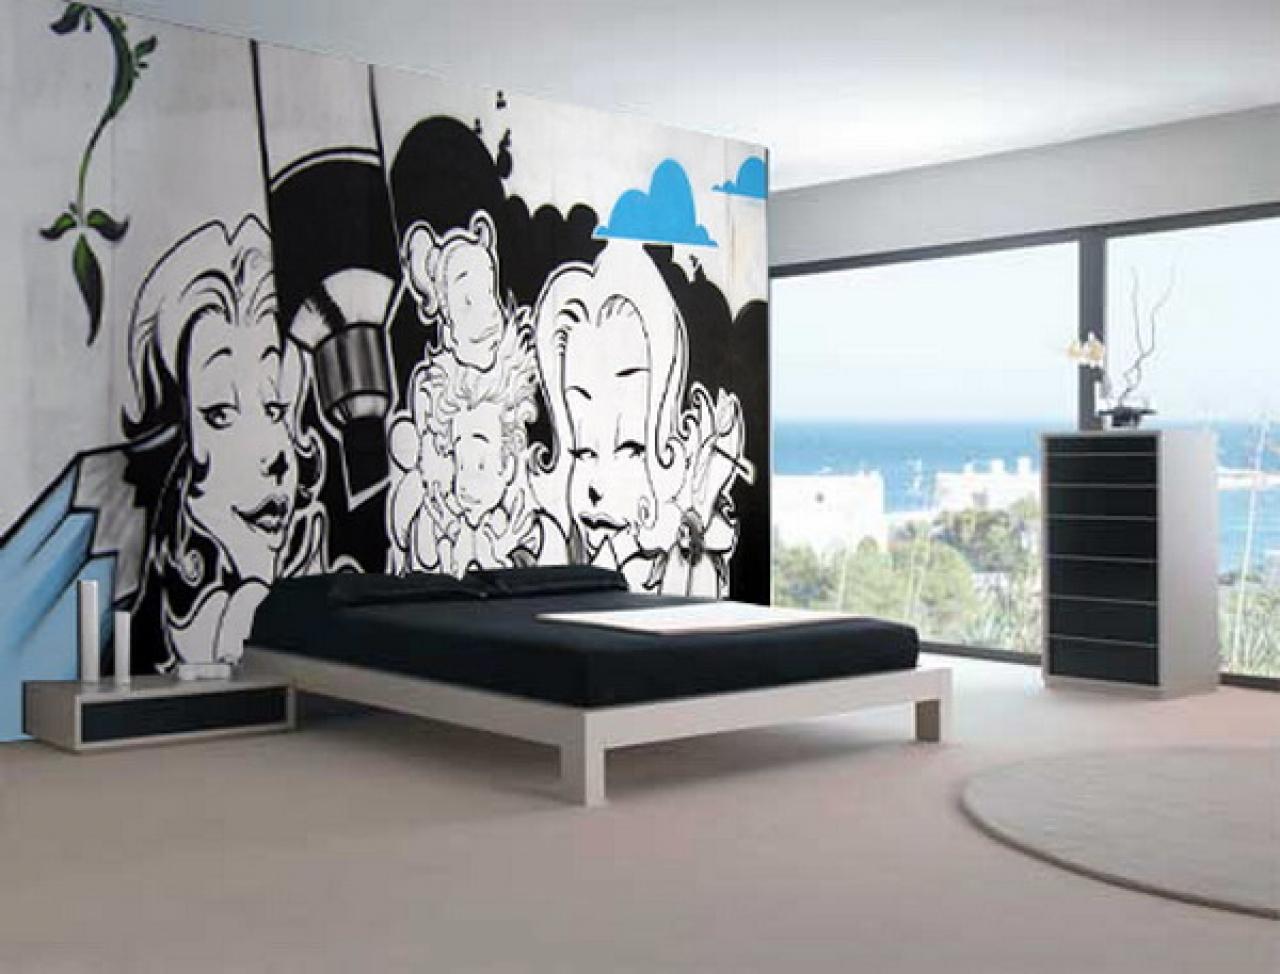 Graffiti boys bedroom ideas picture graffiti bedroom wallpaper 1280x974